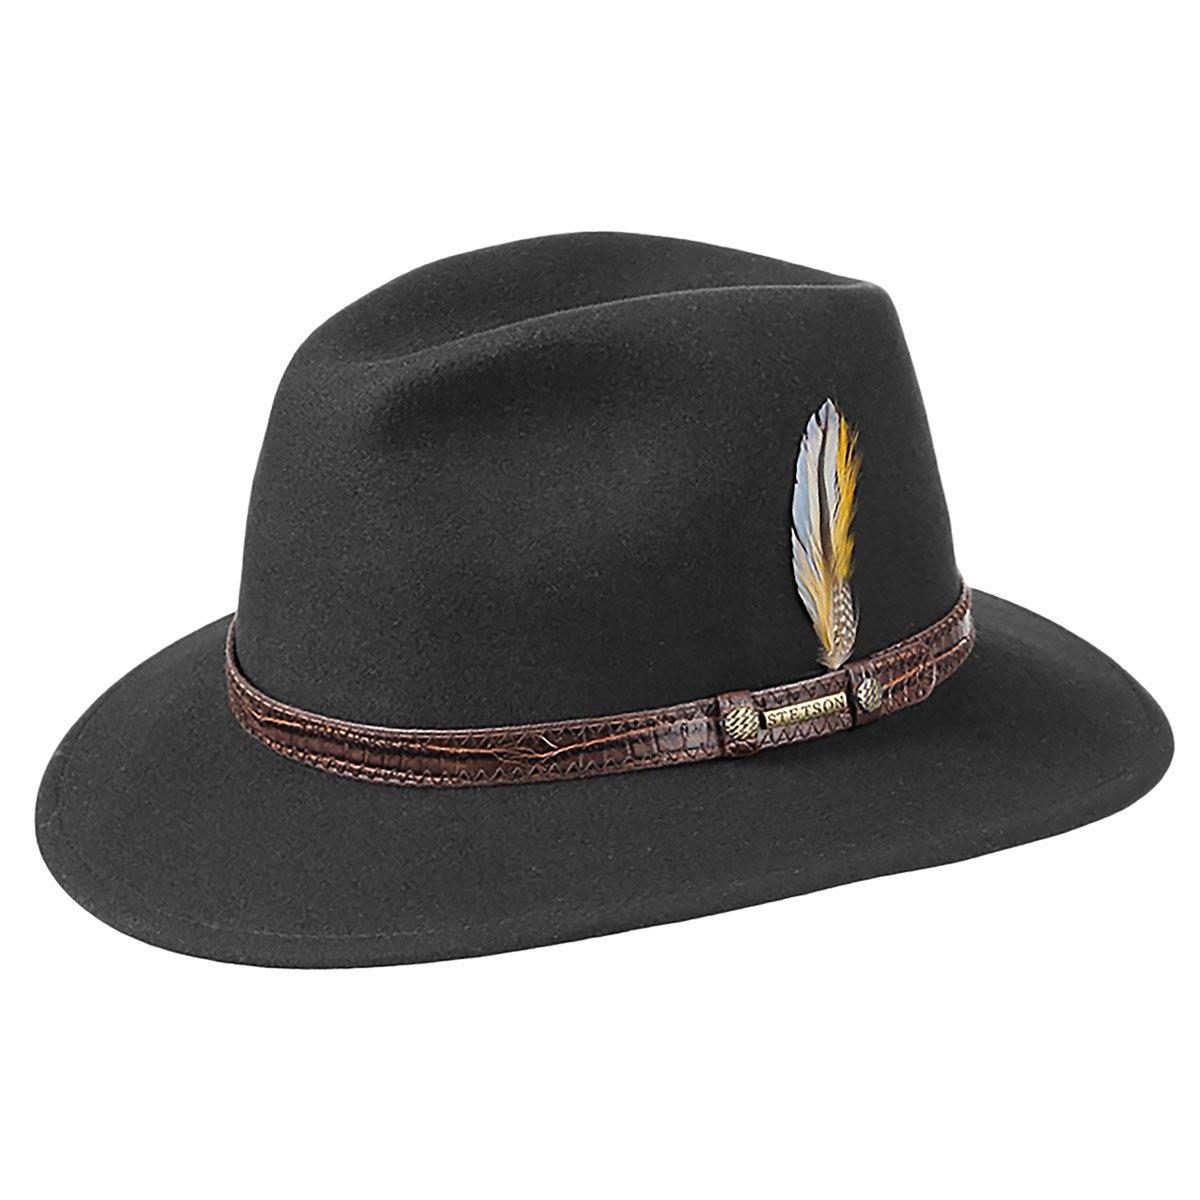 cappello in feltro lana firmato STETSON 9ba8266e2540